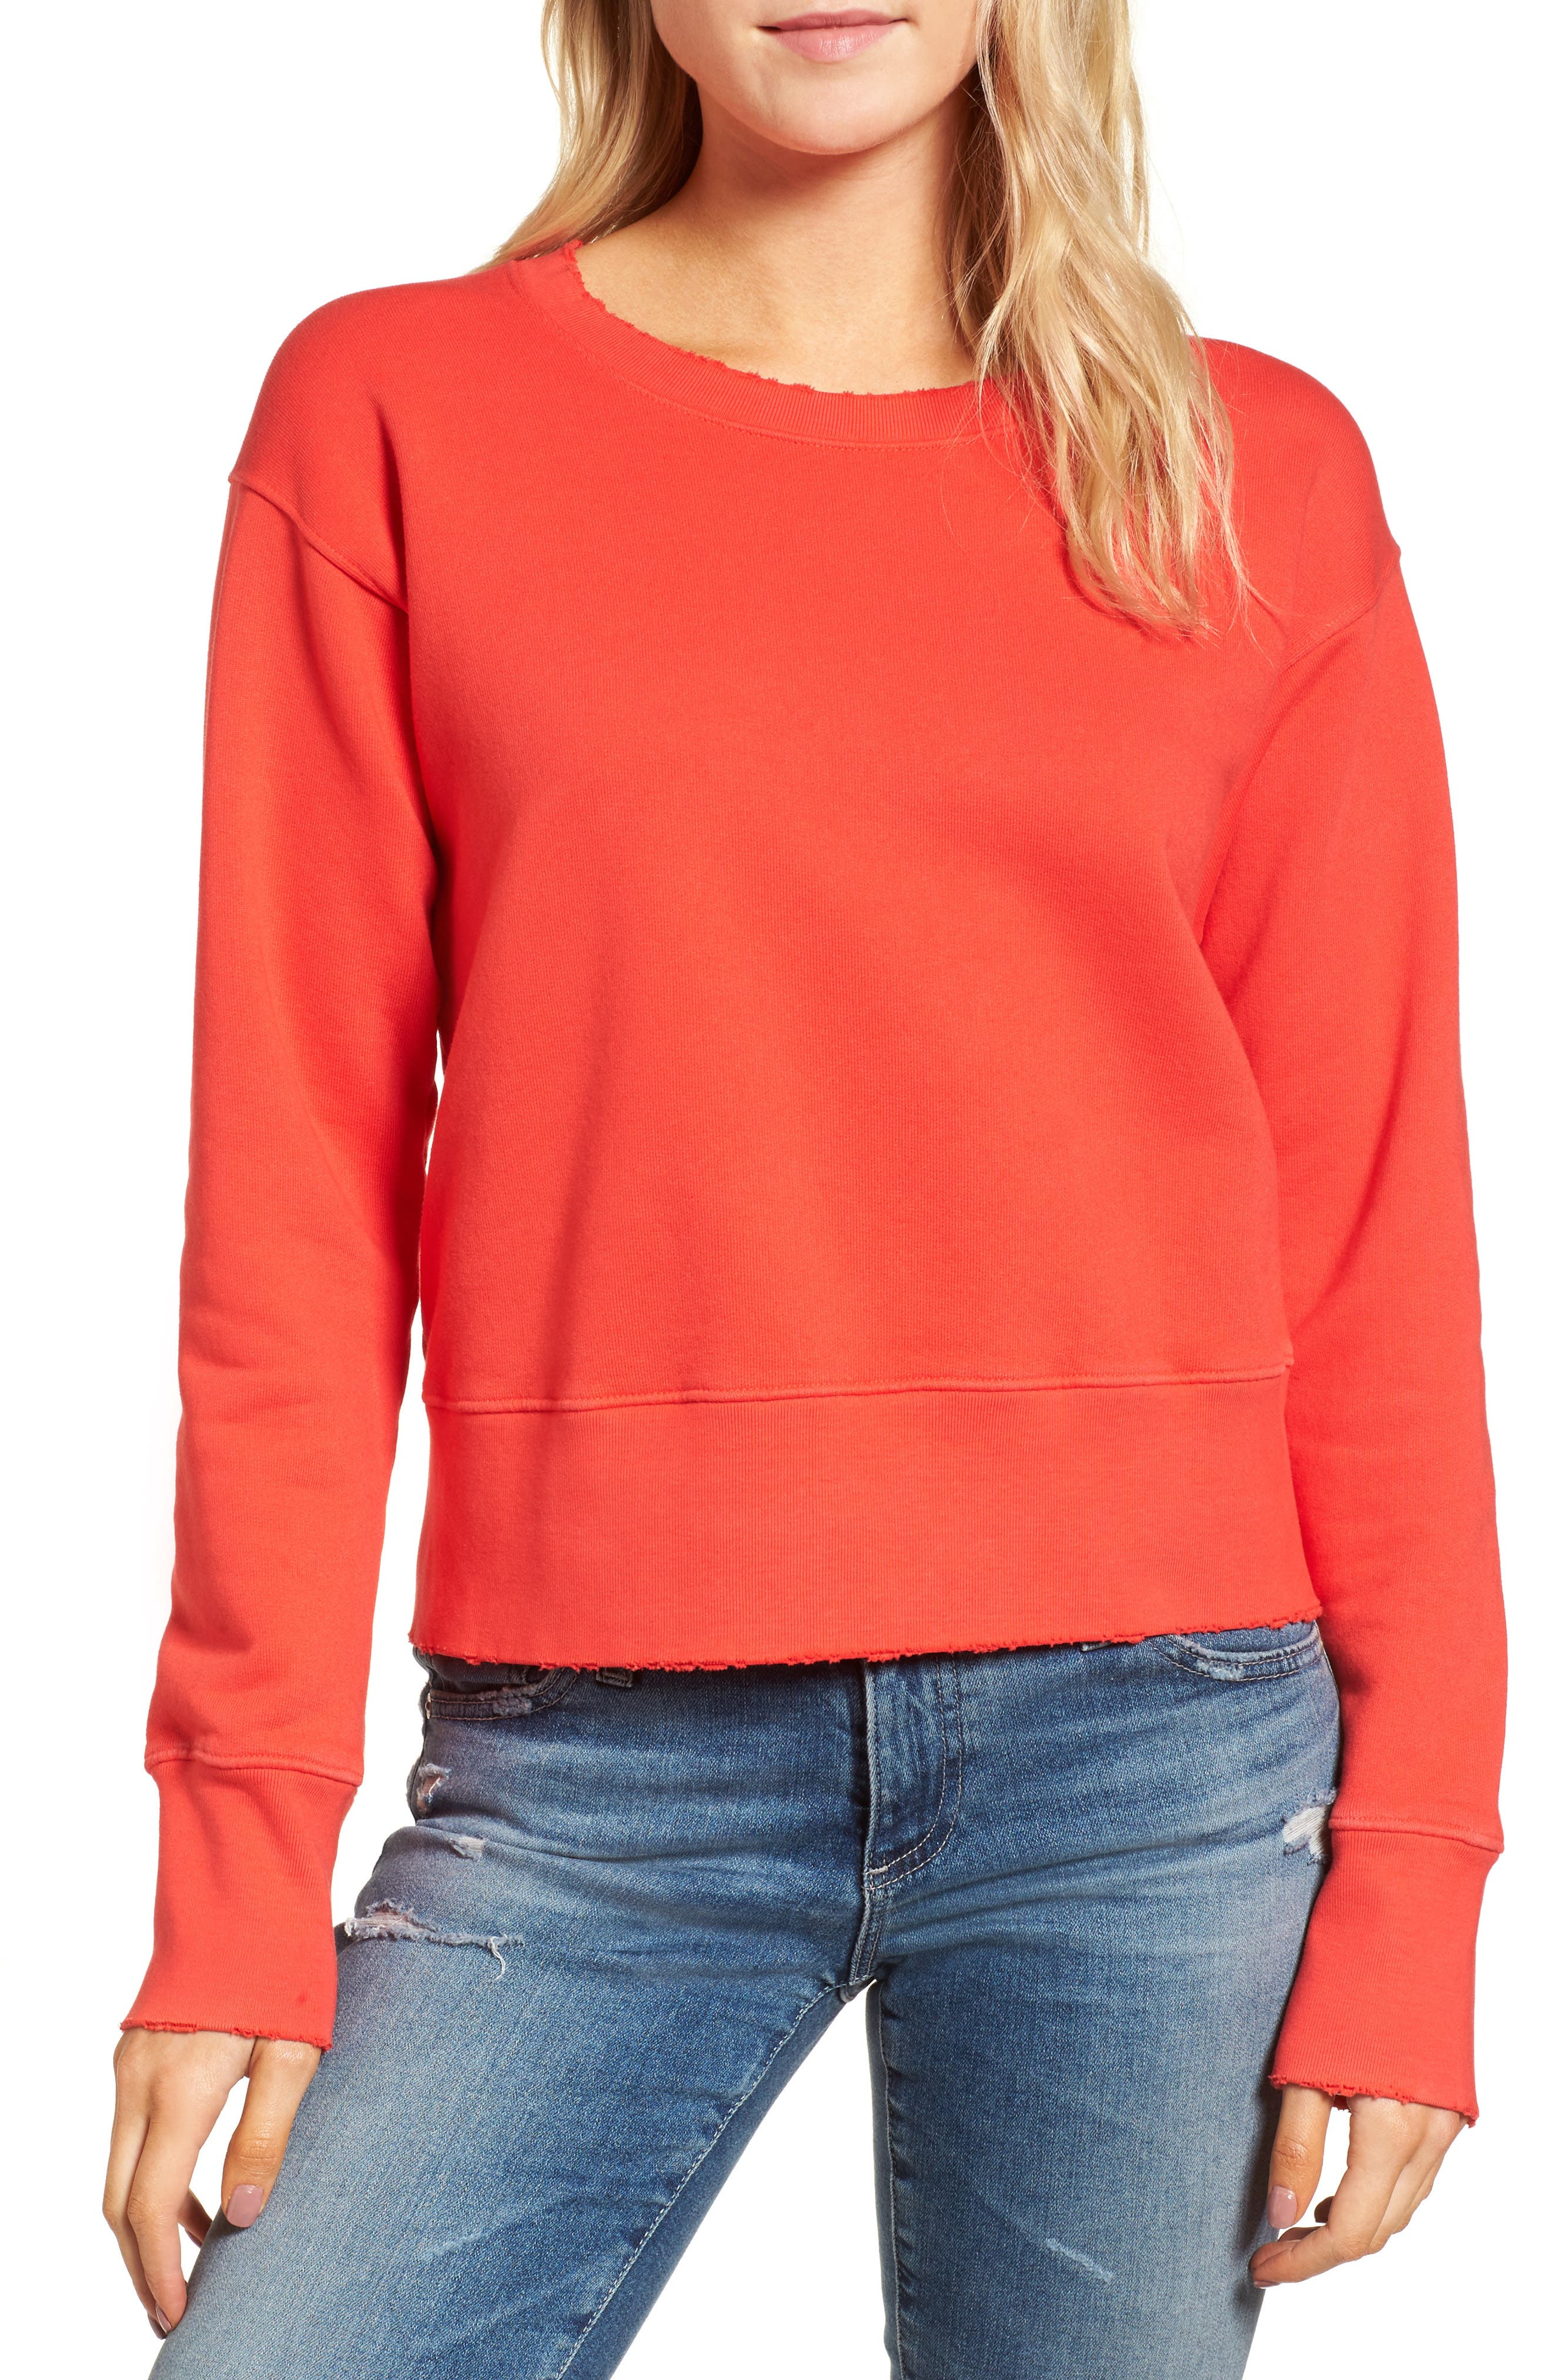 FRANK & EILEEN TEE LAB Distressed Sweatshirt, Main, color, 624